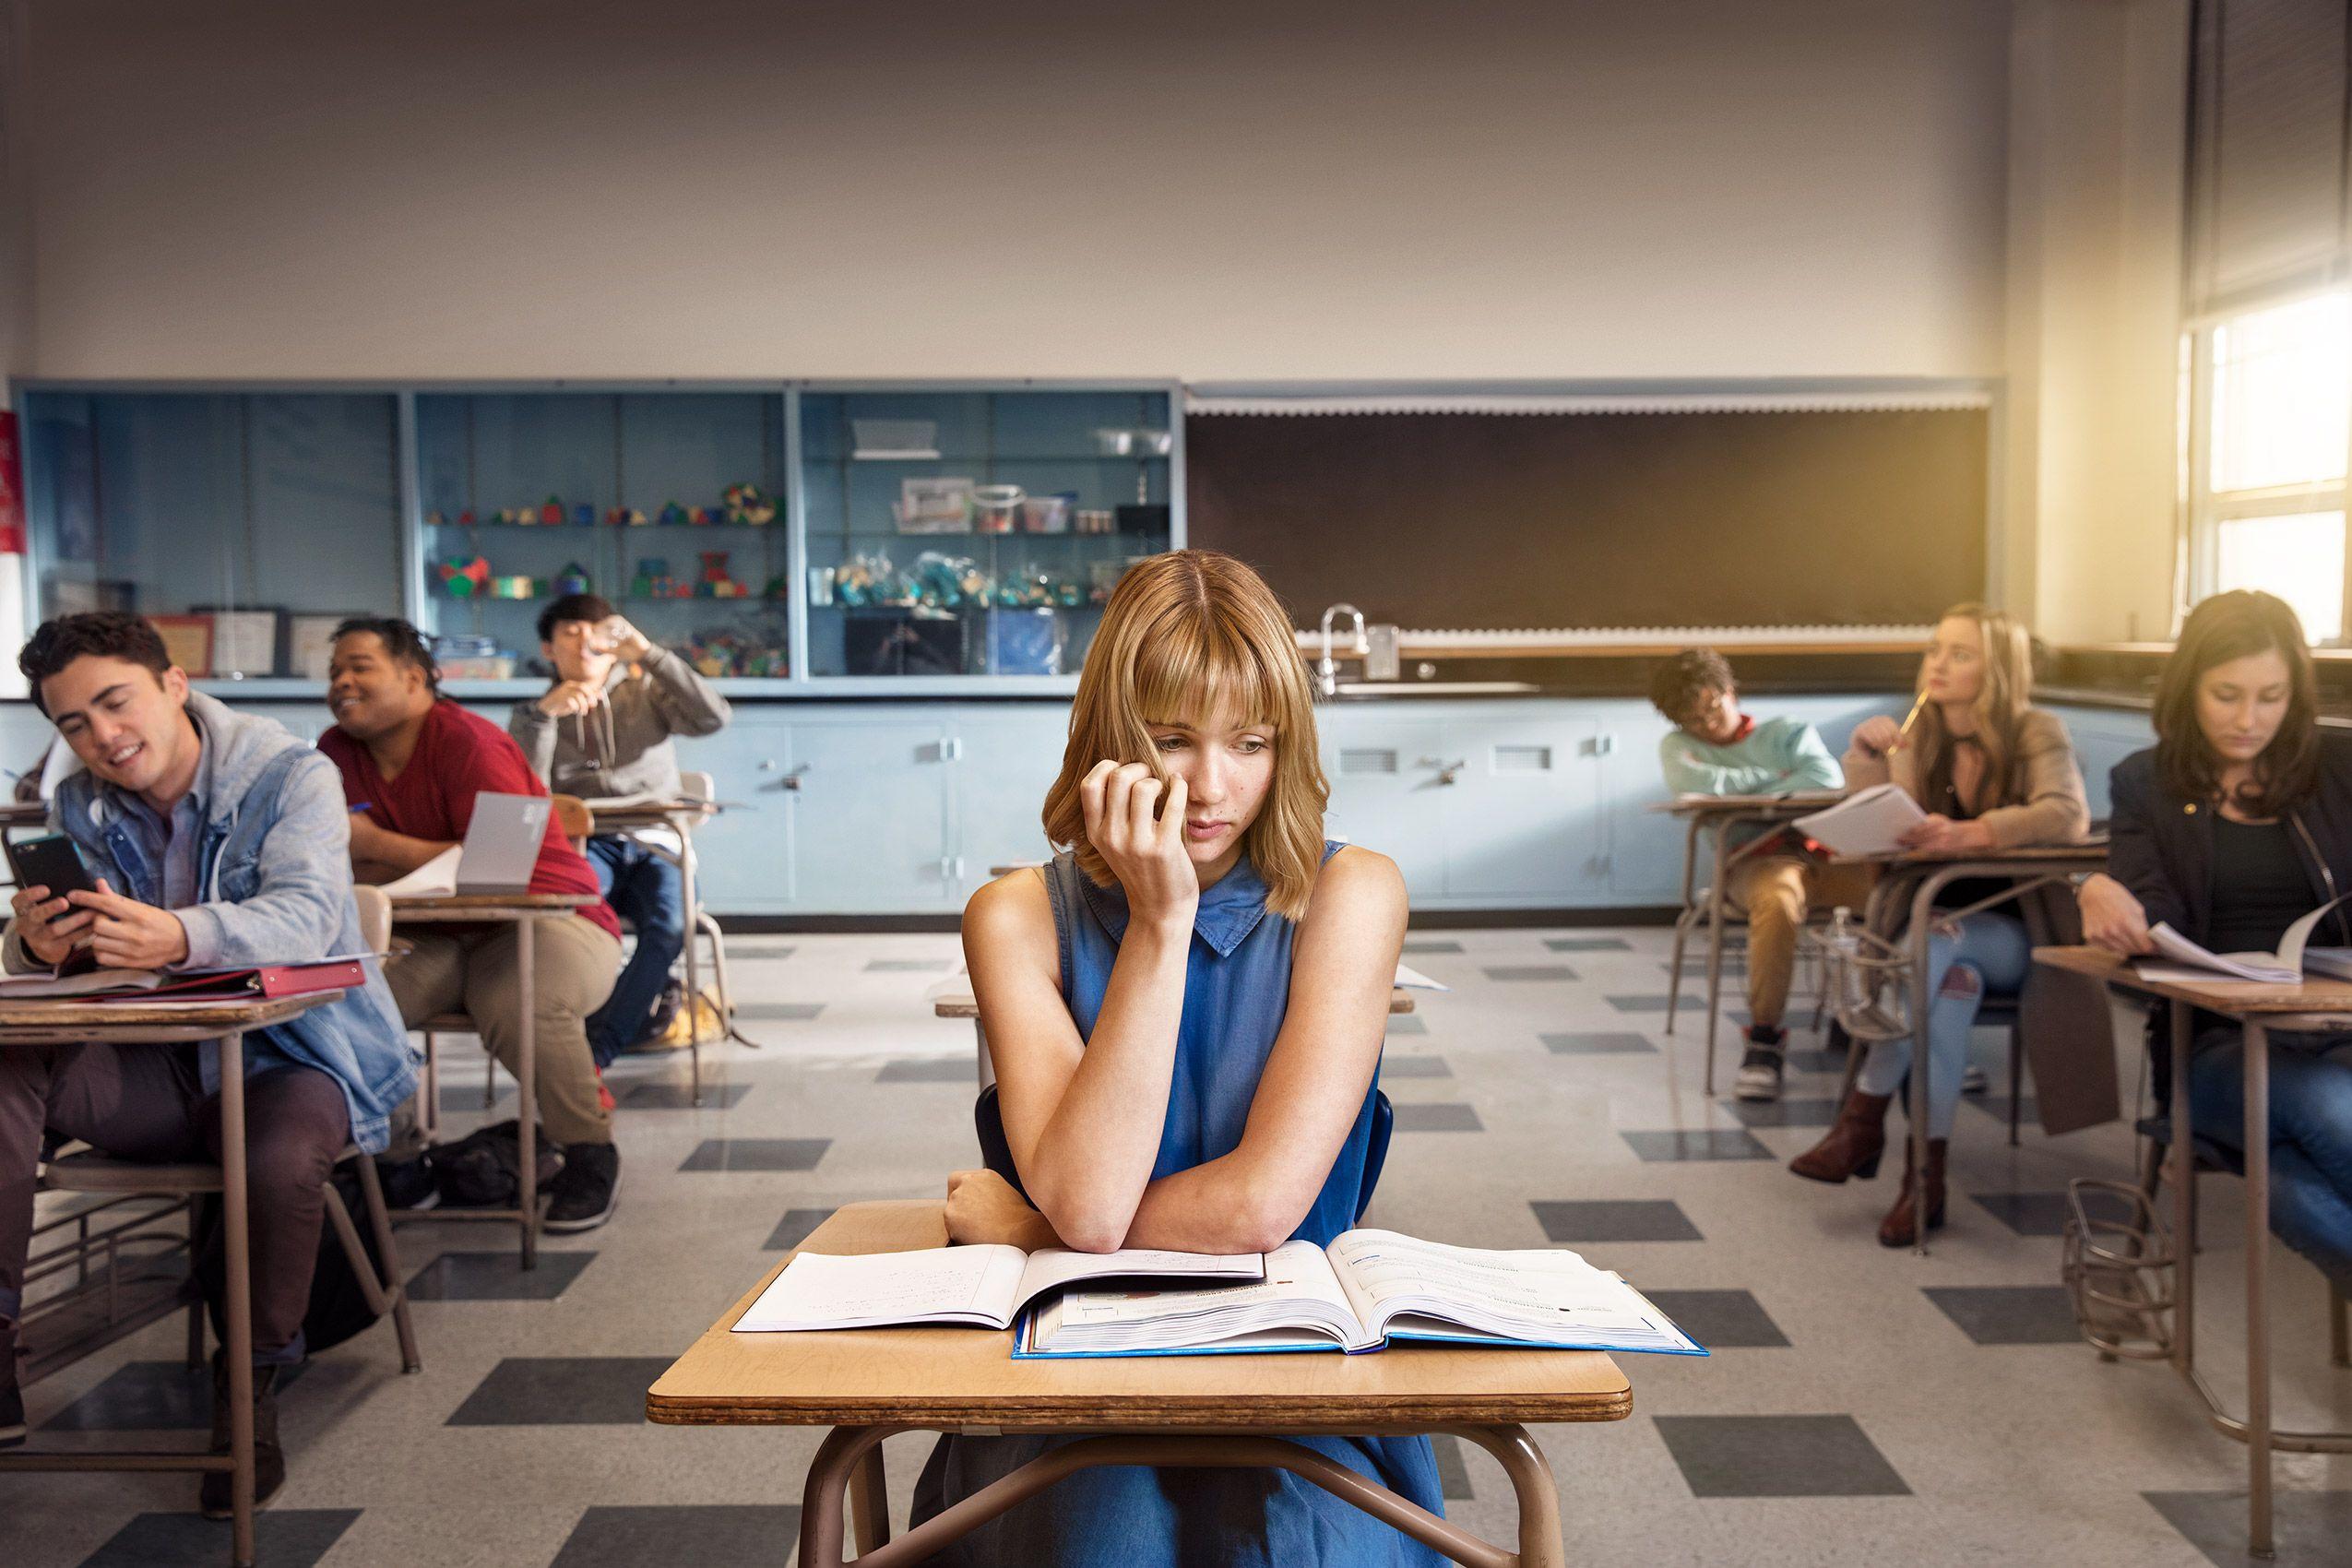 170115_Aqua_Classroom_v1b.jpg